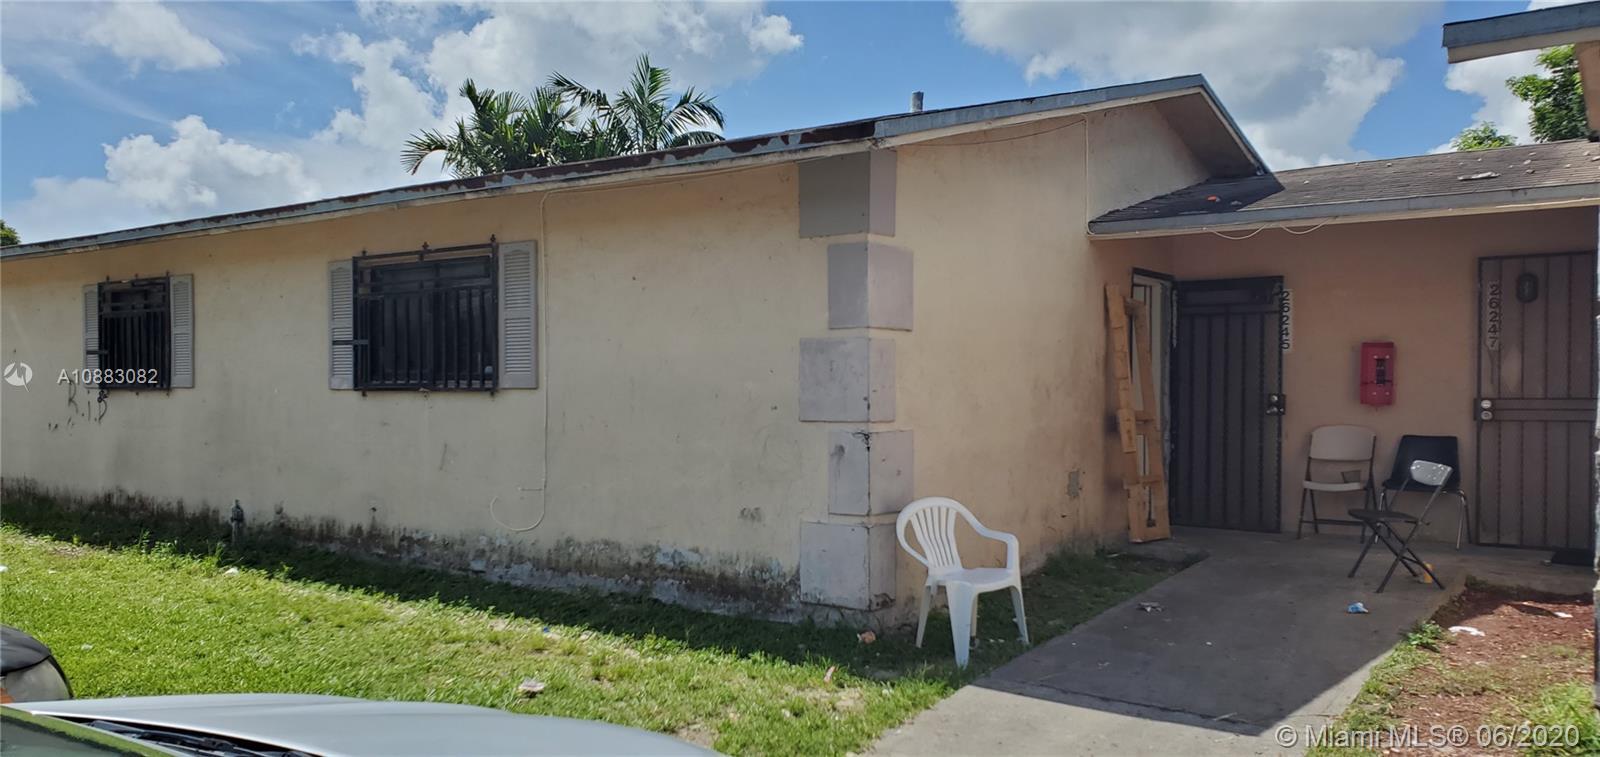 26245 SW 141st Pl #46 Property Photo